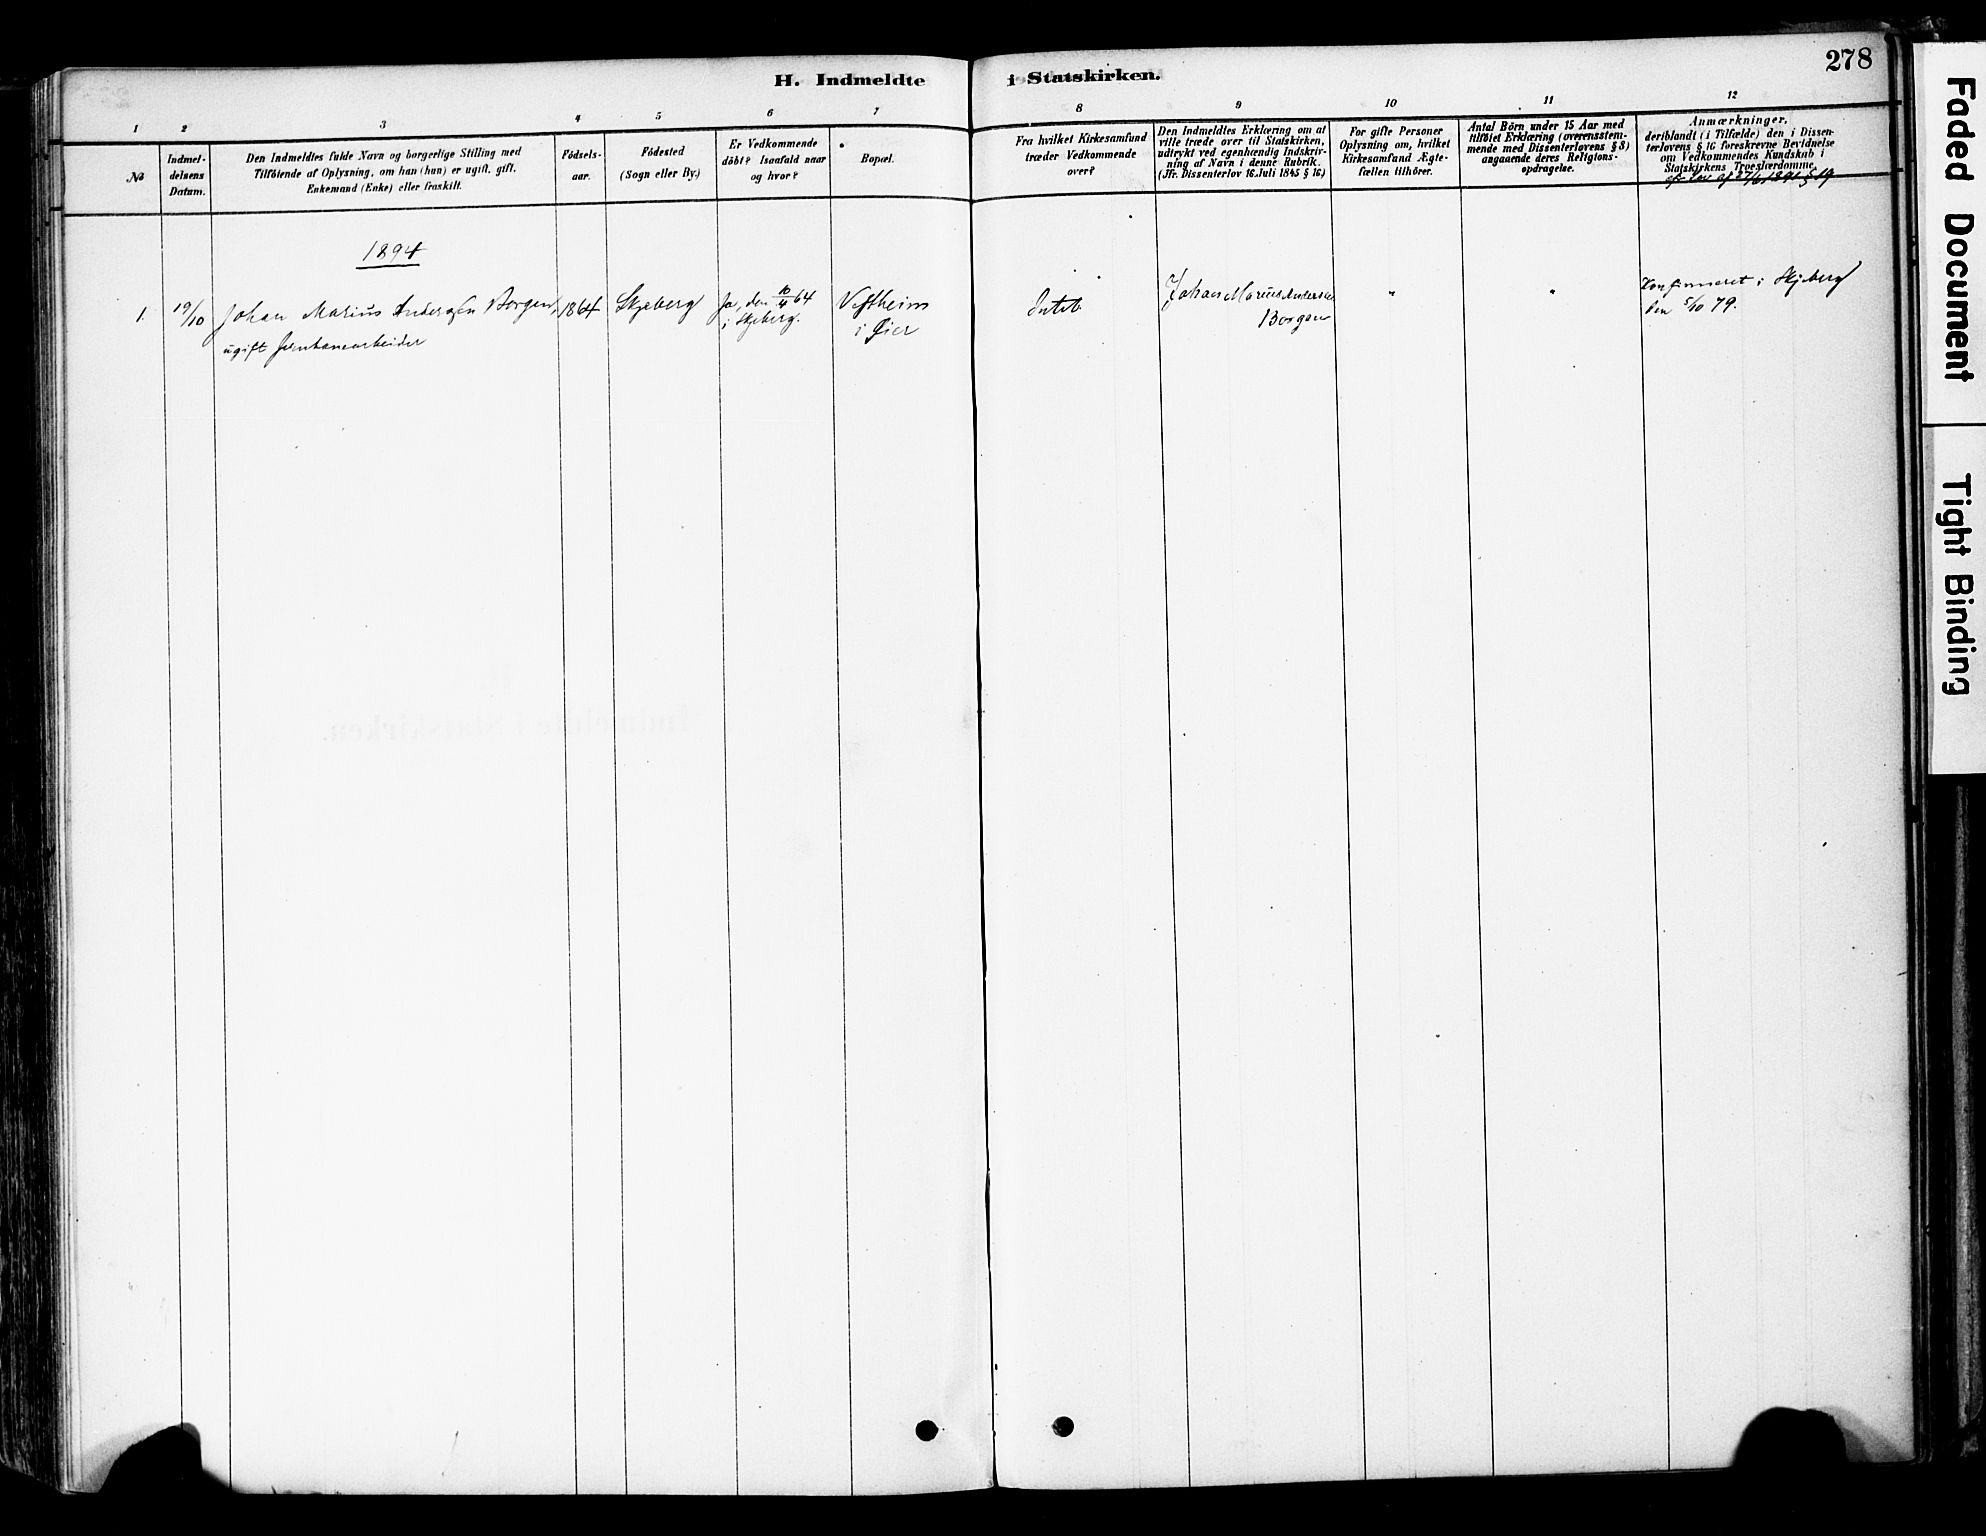 SAH, Øyer prestekontor, Ministerialbok nr. 8, 1878-1897, s. 278